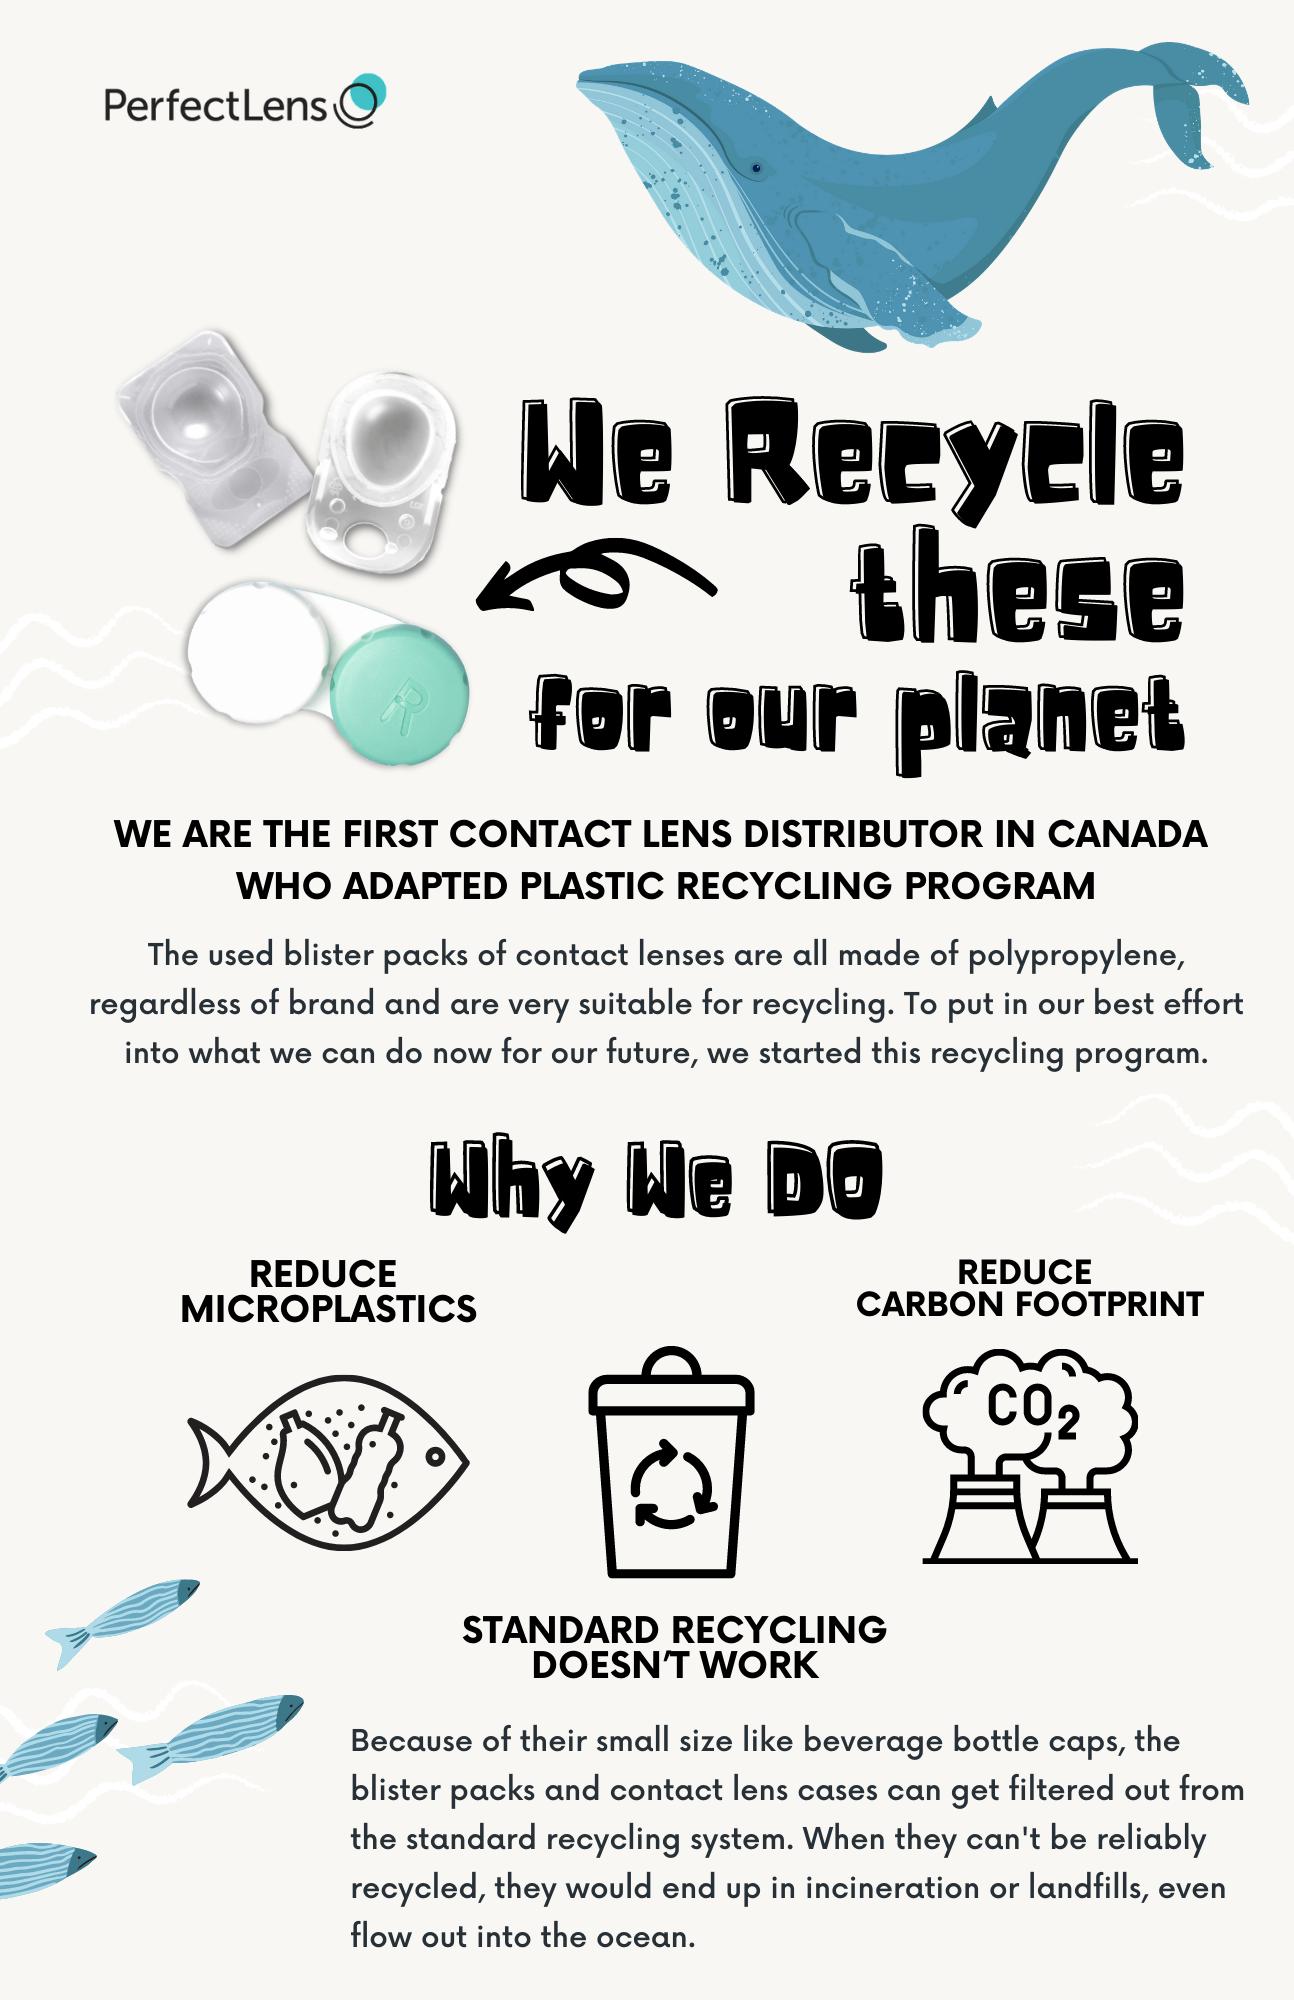 PerfectLens プラスチックリサイクル